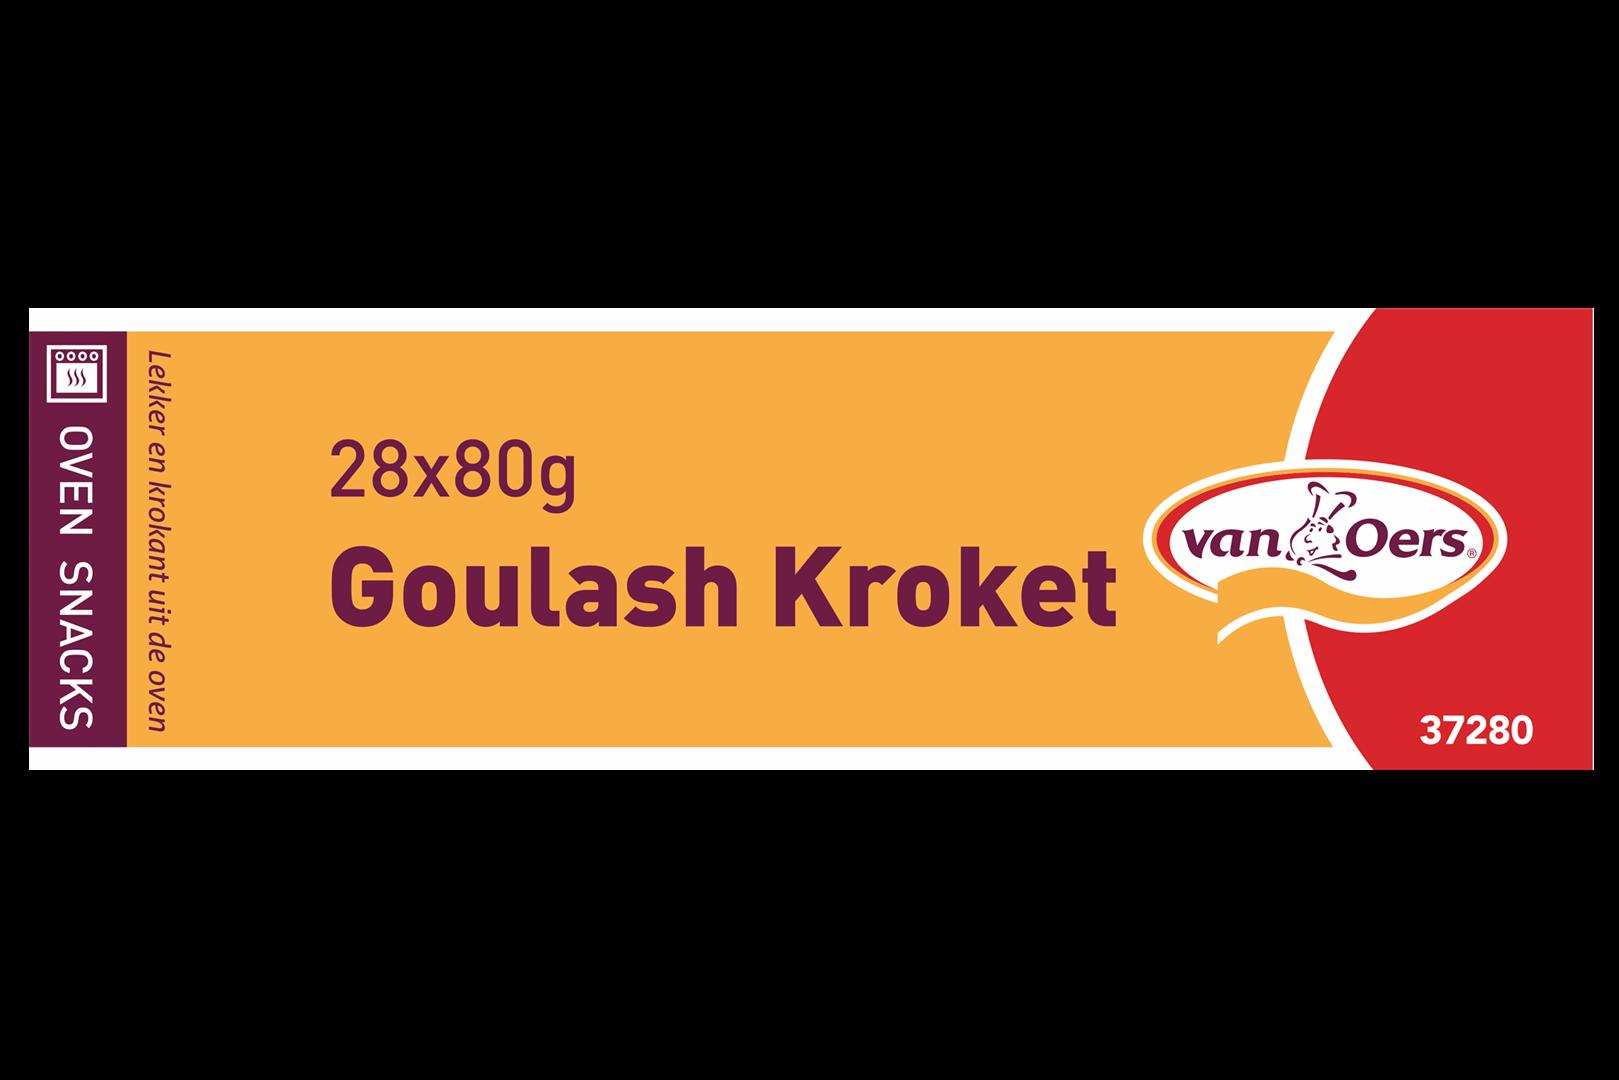 Productafbeelding Van Oers Goulashkroket Oven Grill 28x80g